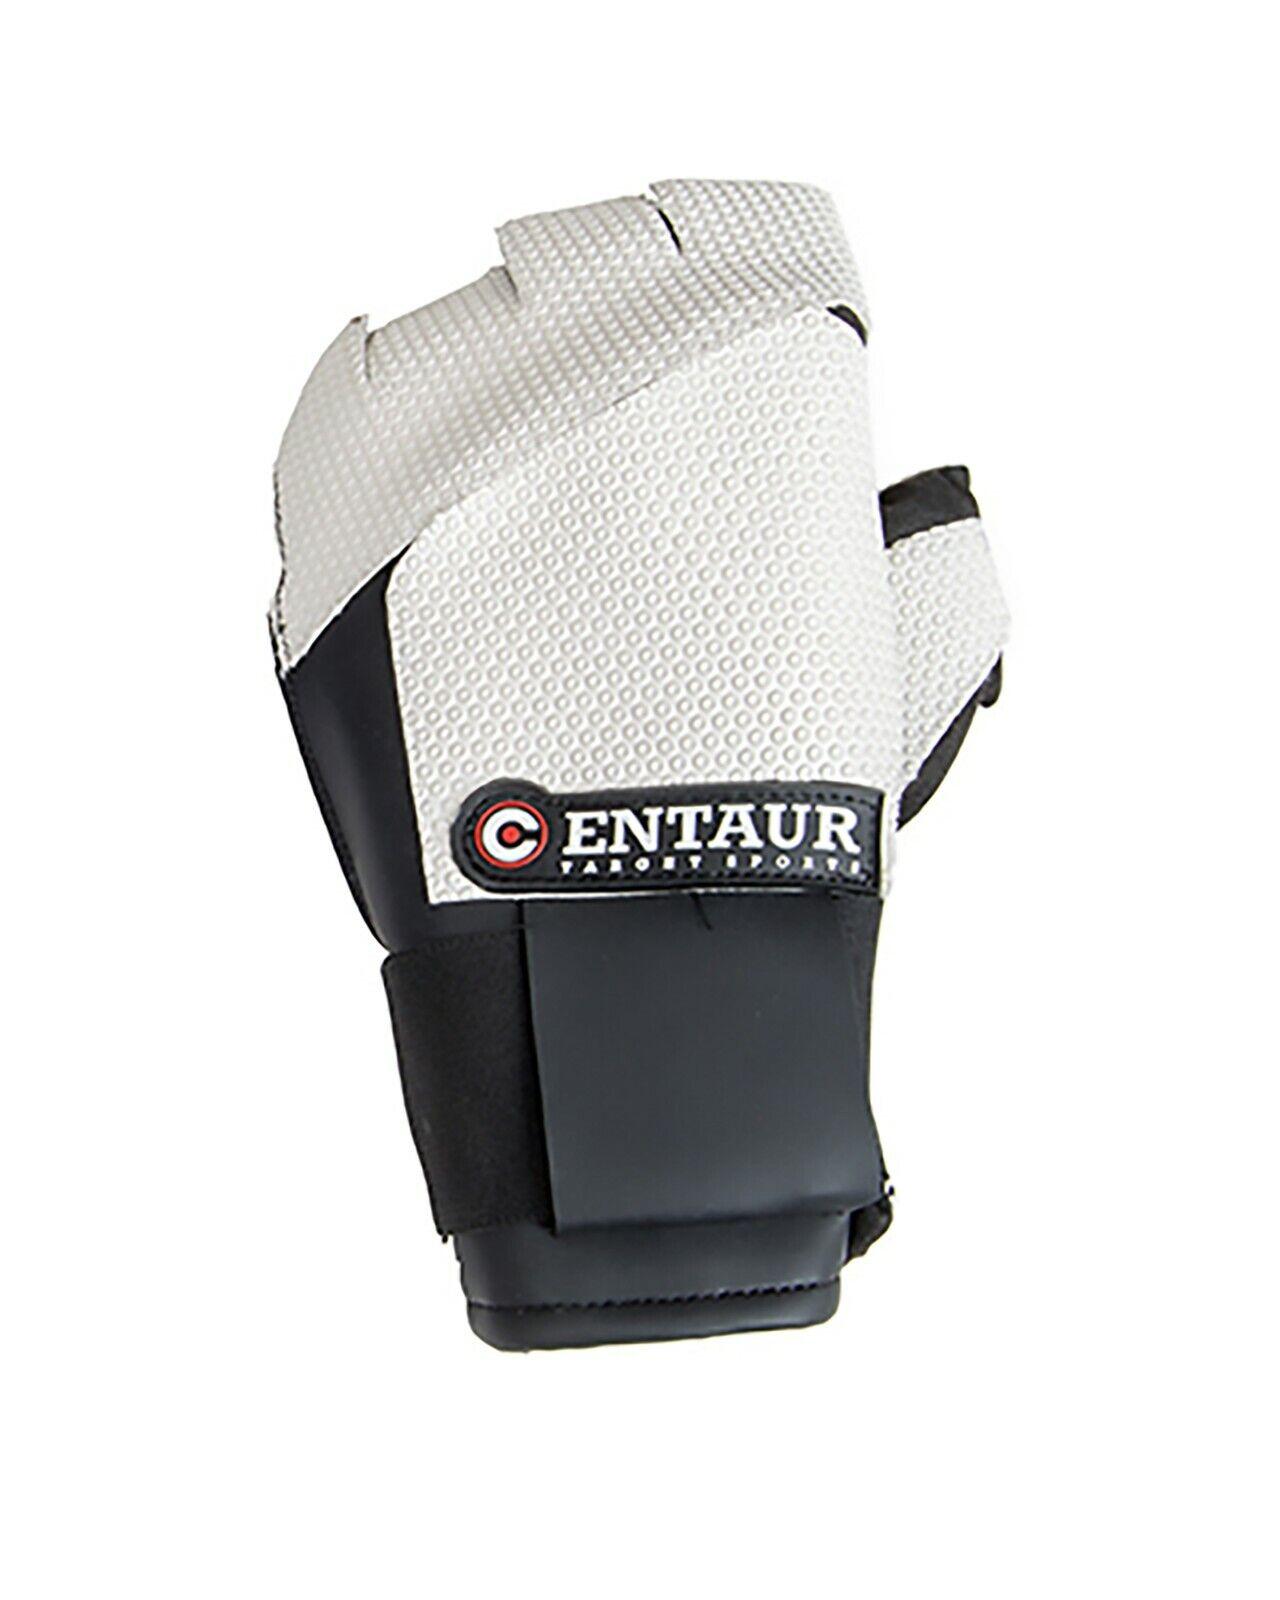 Centaur 'Pro Fingerless Guante de tiro'